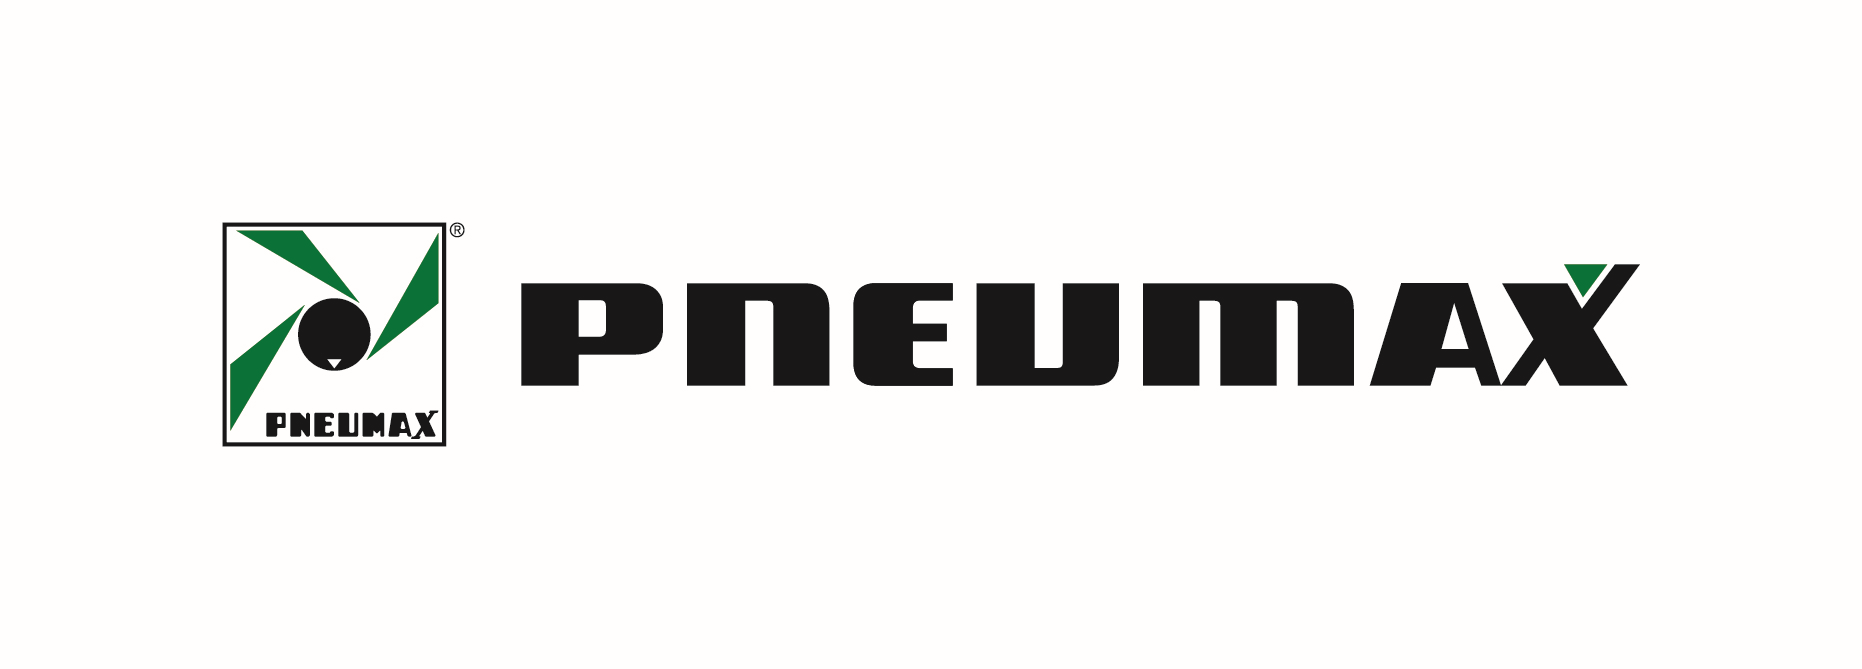 1630310853-pneumax.png